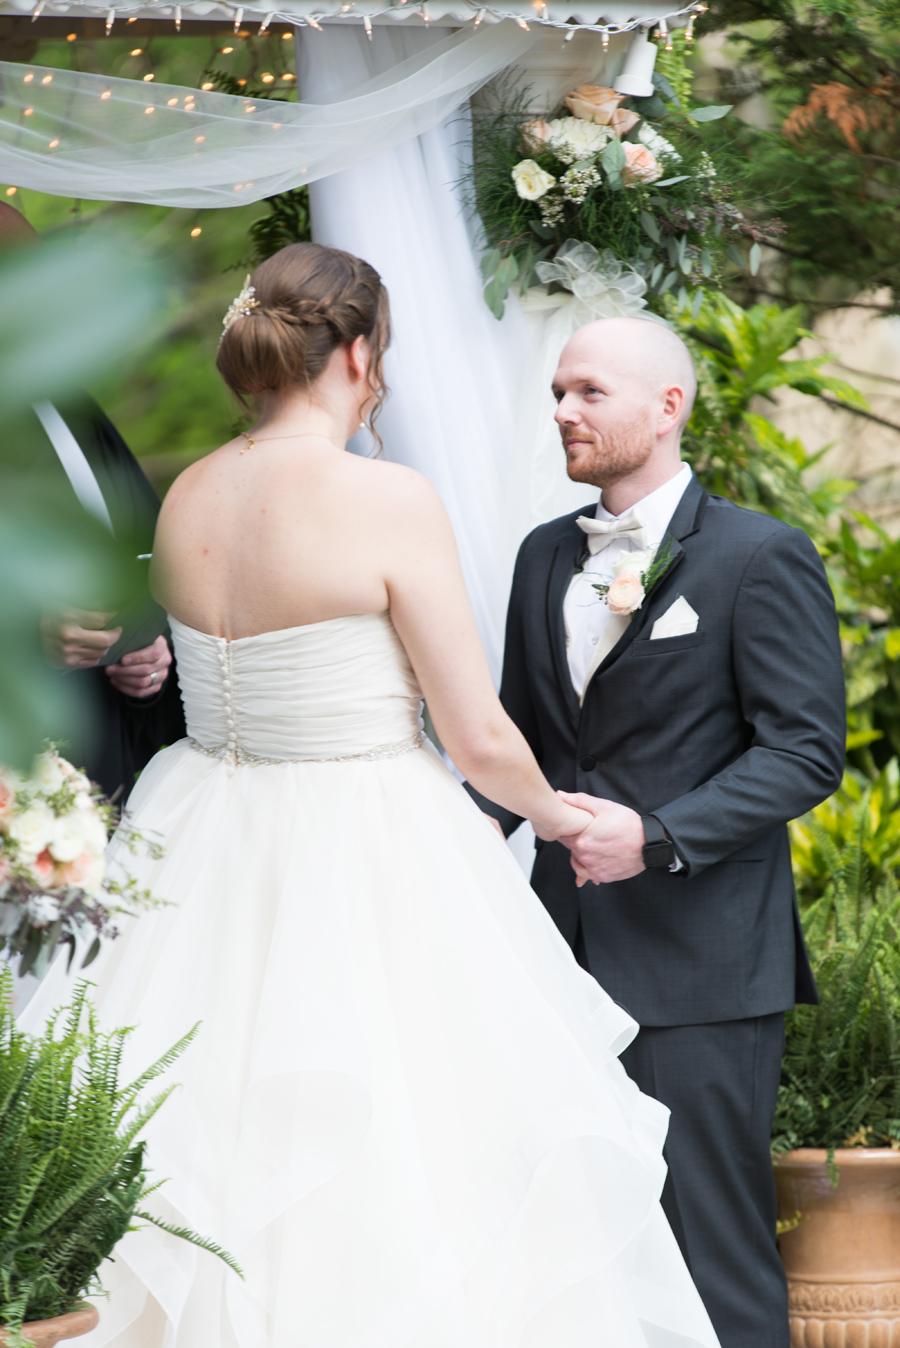 KrisandraEvans.com | Atlanta Wedding Photographer | Cedar Plantation Wedding